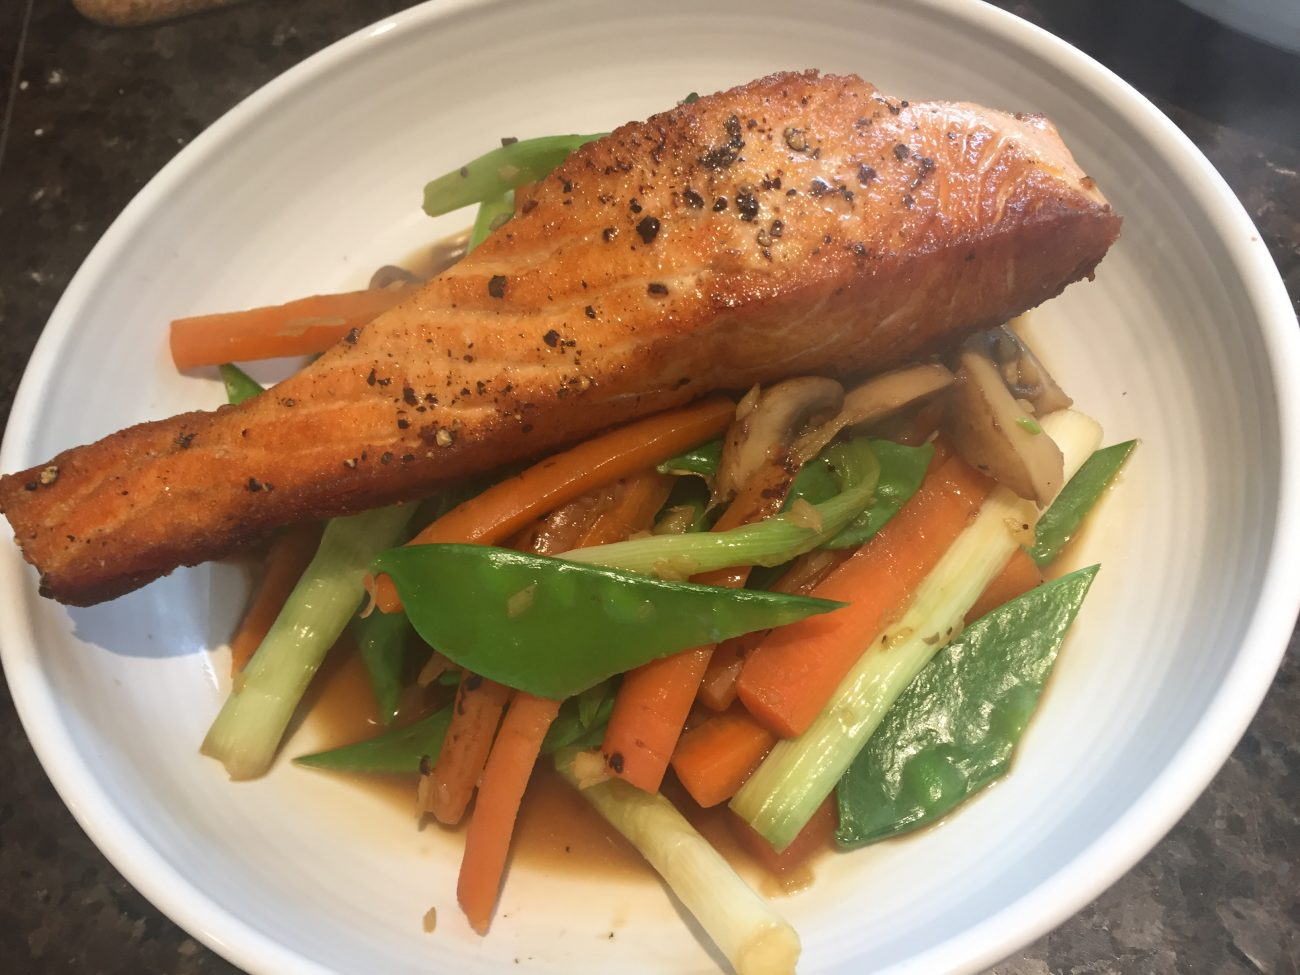 Salmon and Gingered Veggies